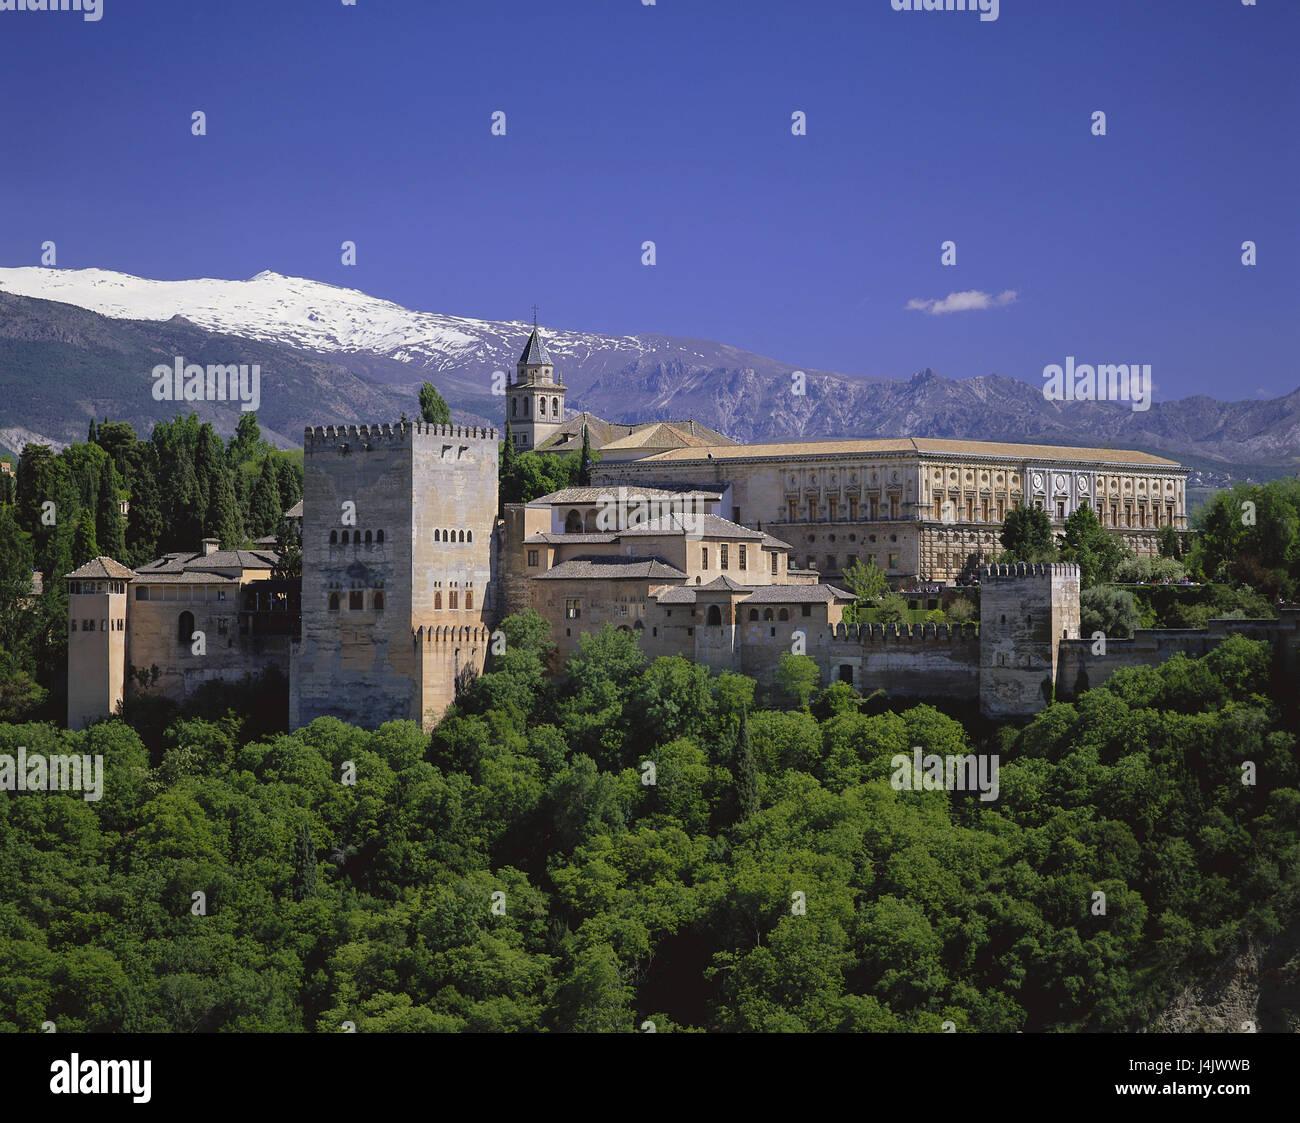 Alhambra Sage Granada Park Alhambra Ca: Lock 13 Stock Photos & Lock 13 Stock Images